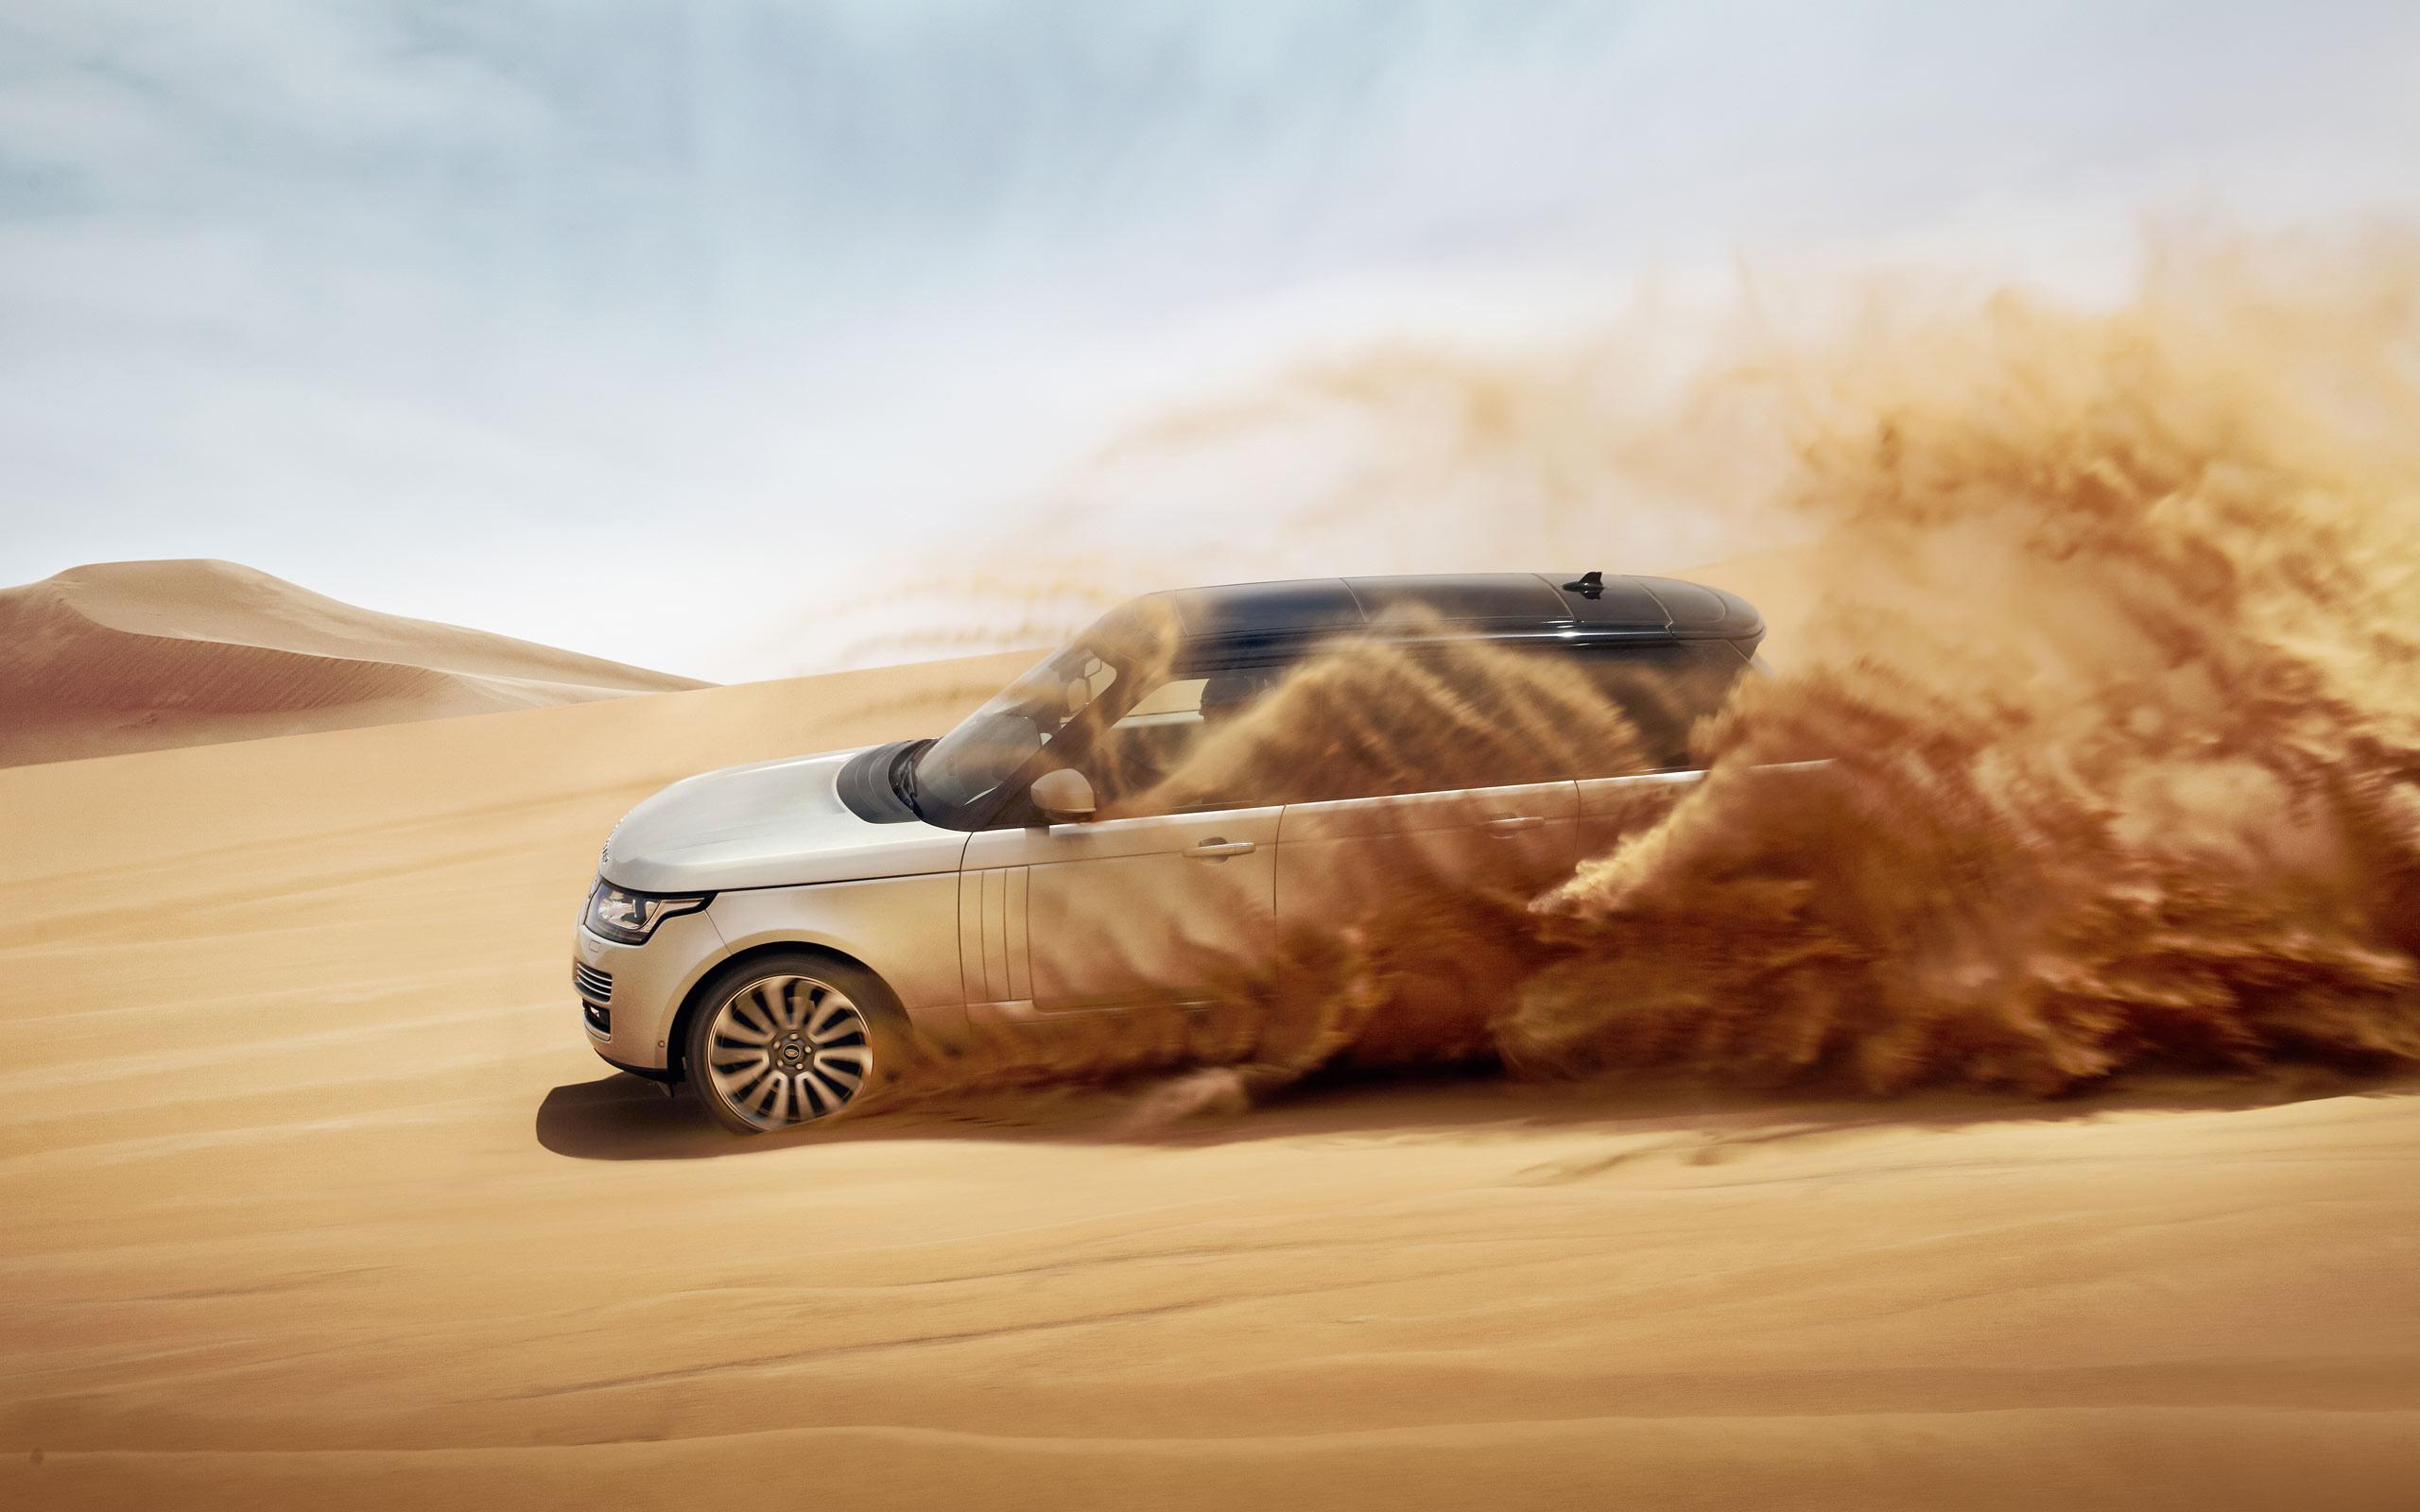 2013 Land Rover Range Rover 4 Wallpaper Hd Car Wallpapers